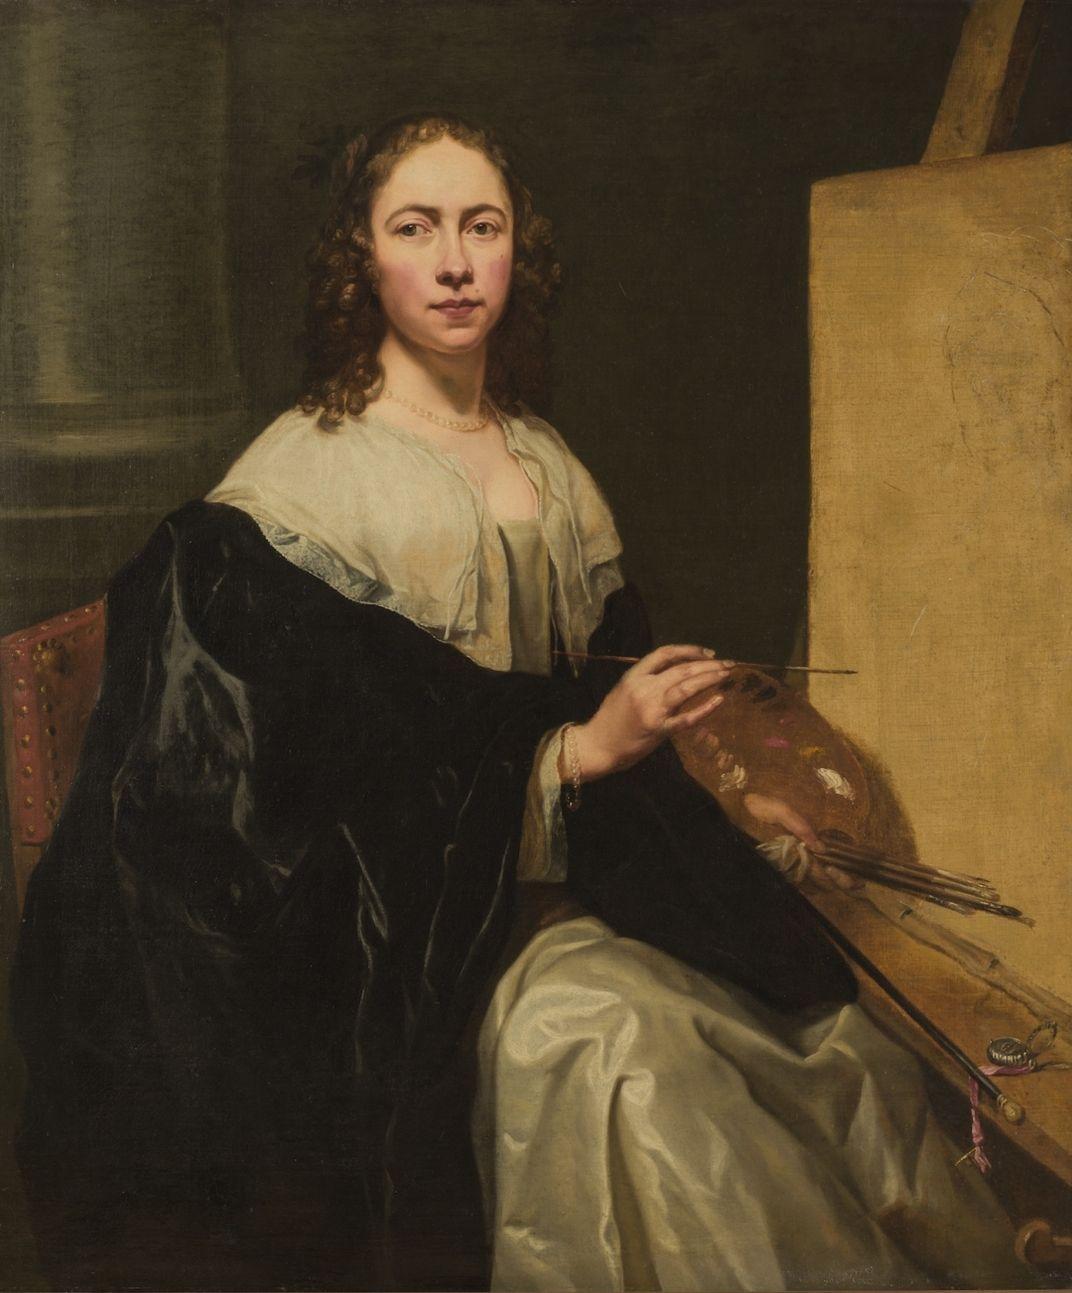 'Baroque's Leading Lady' Artist Michaelina Wautier Finally Gets Retrospective